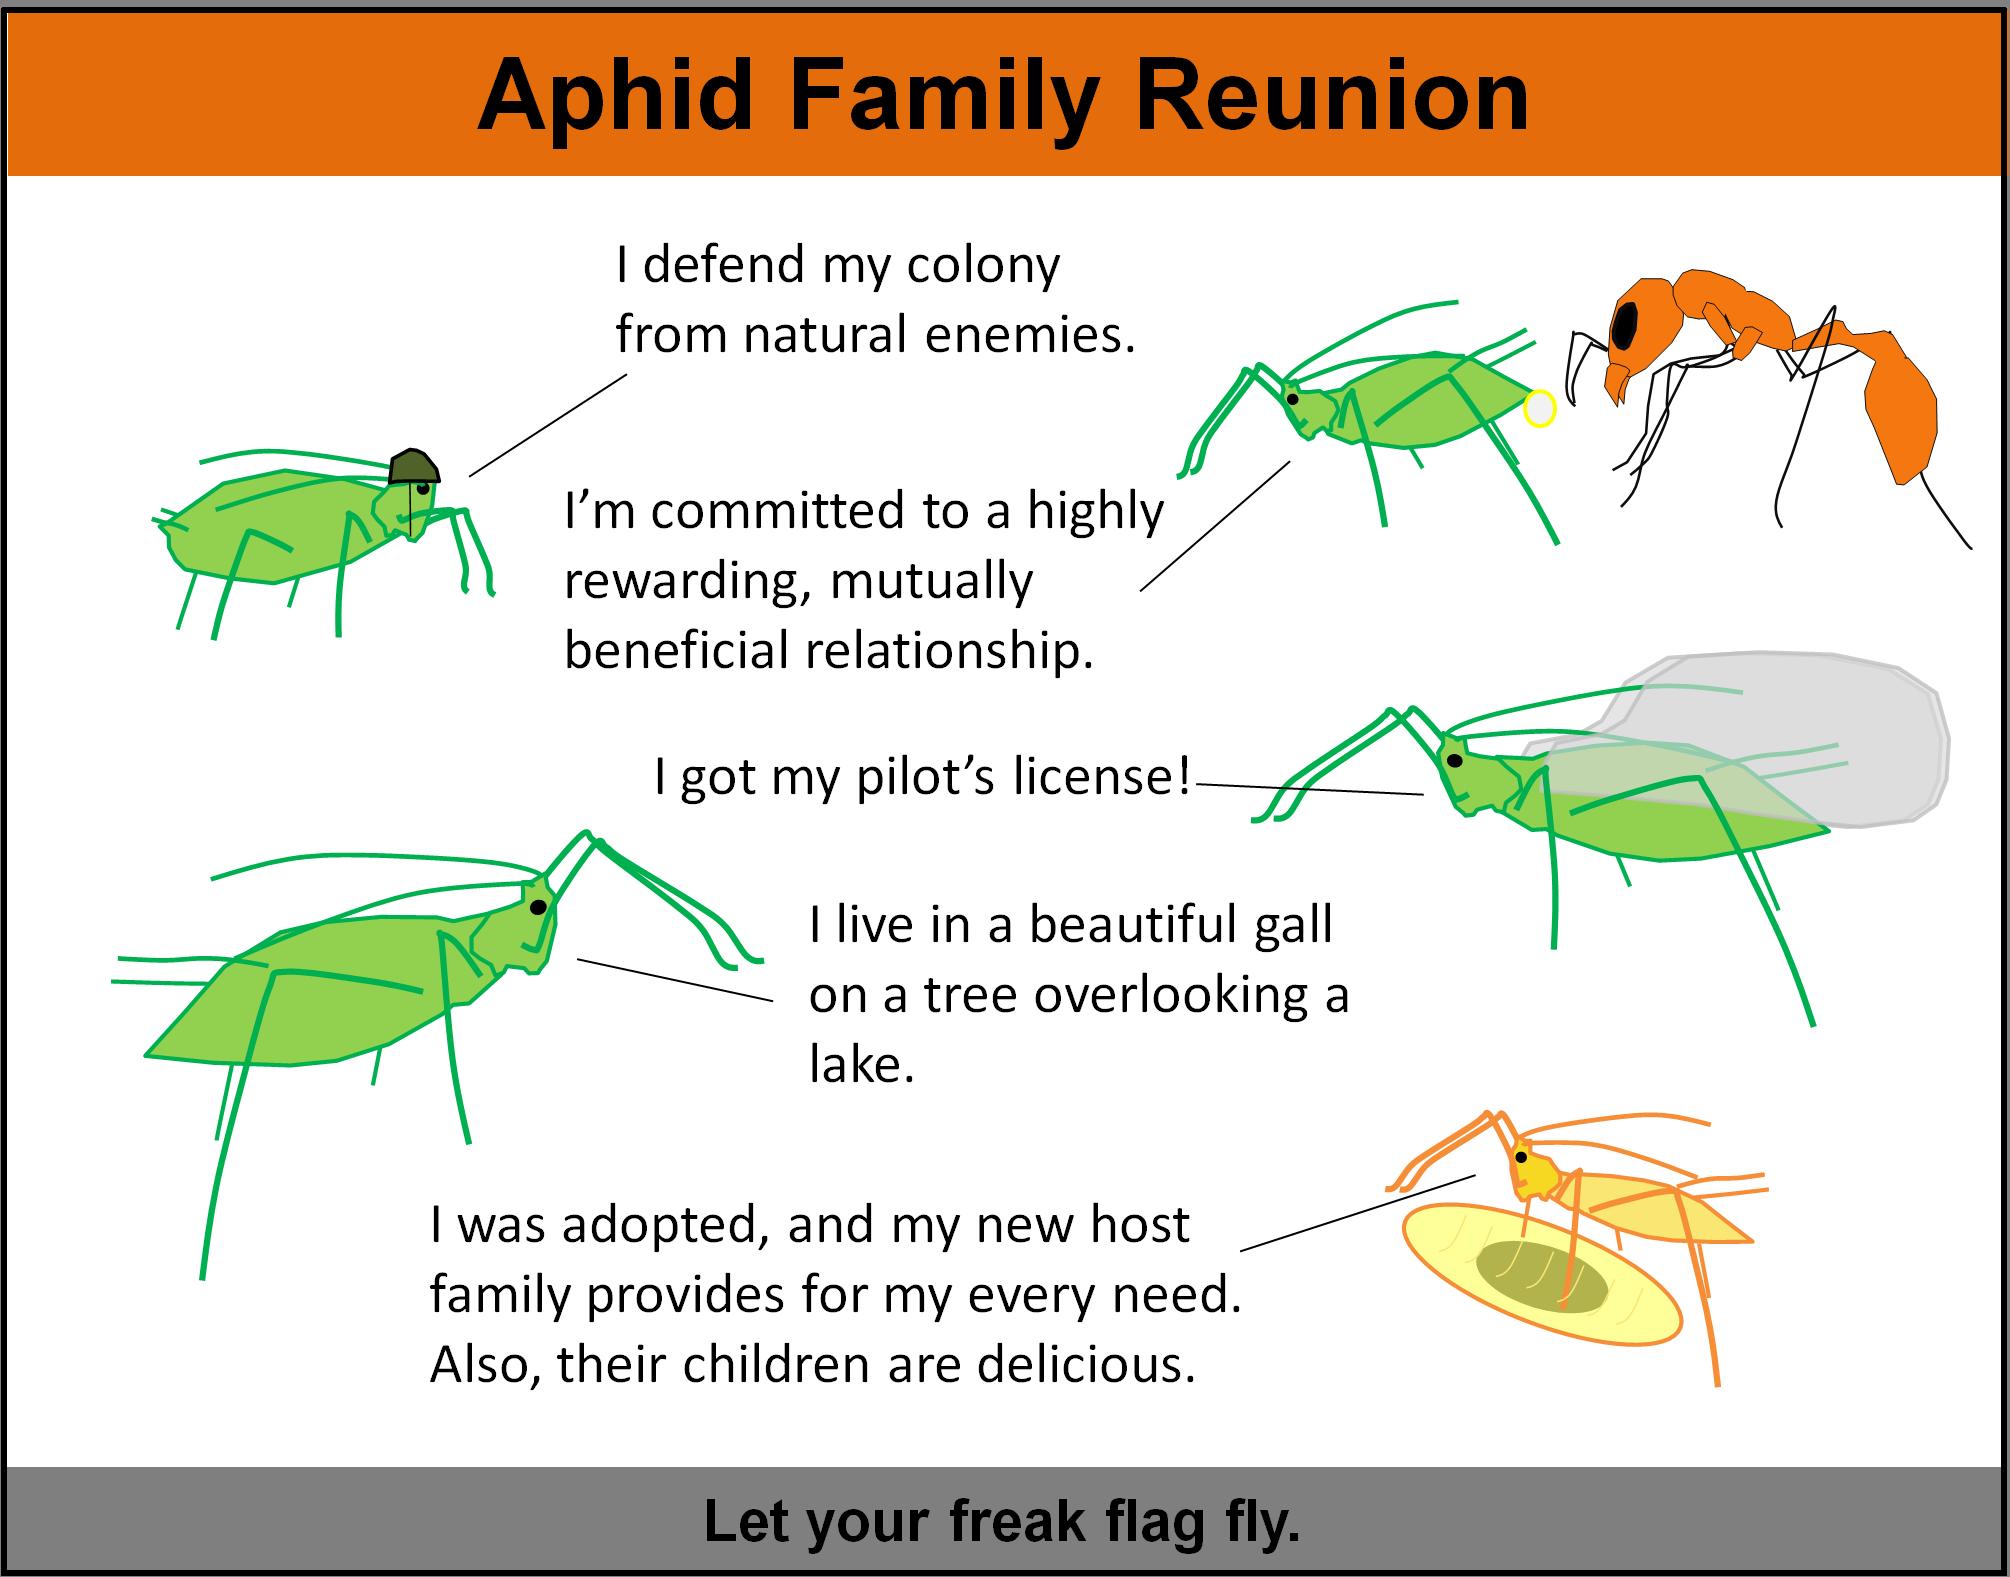 Aphidfamilyreunion